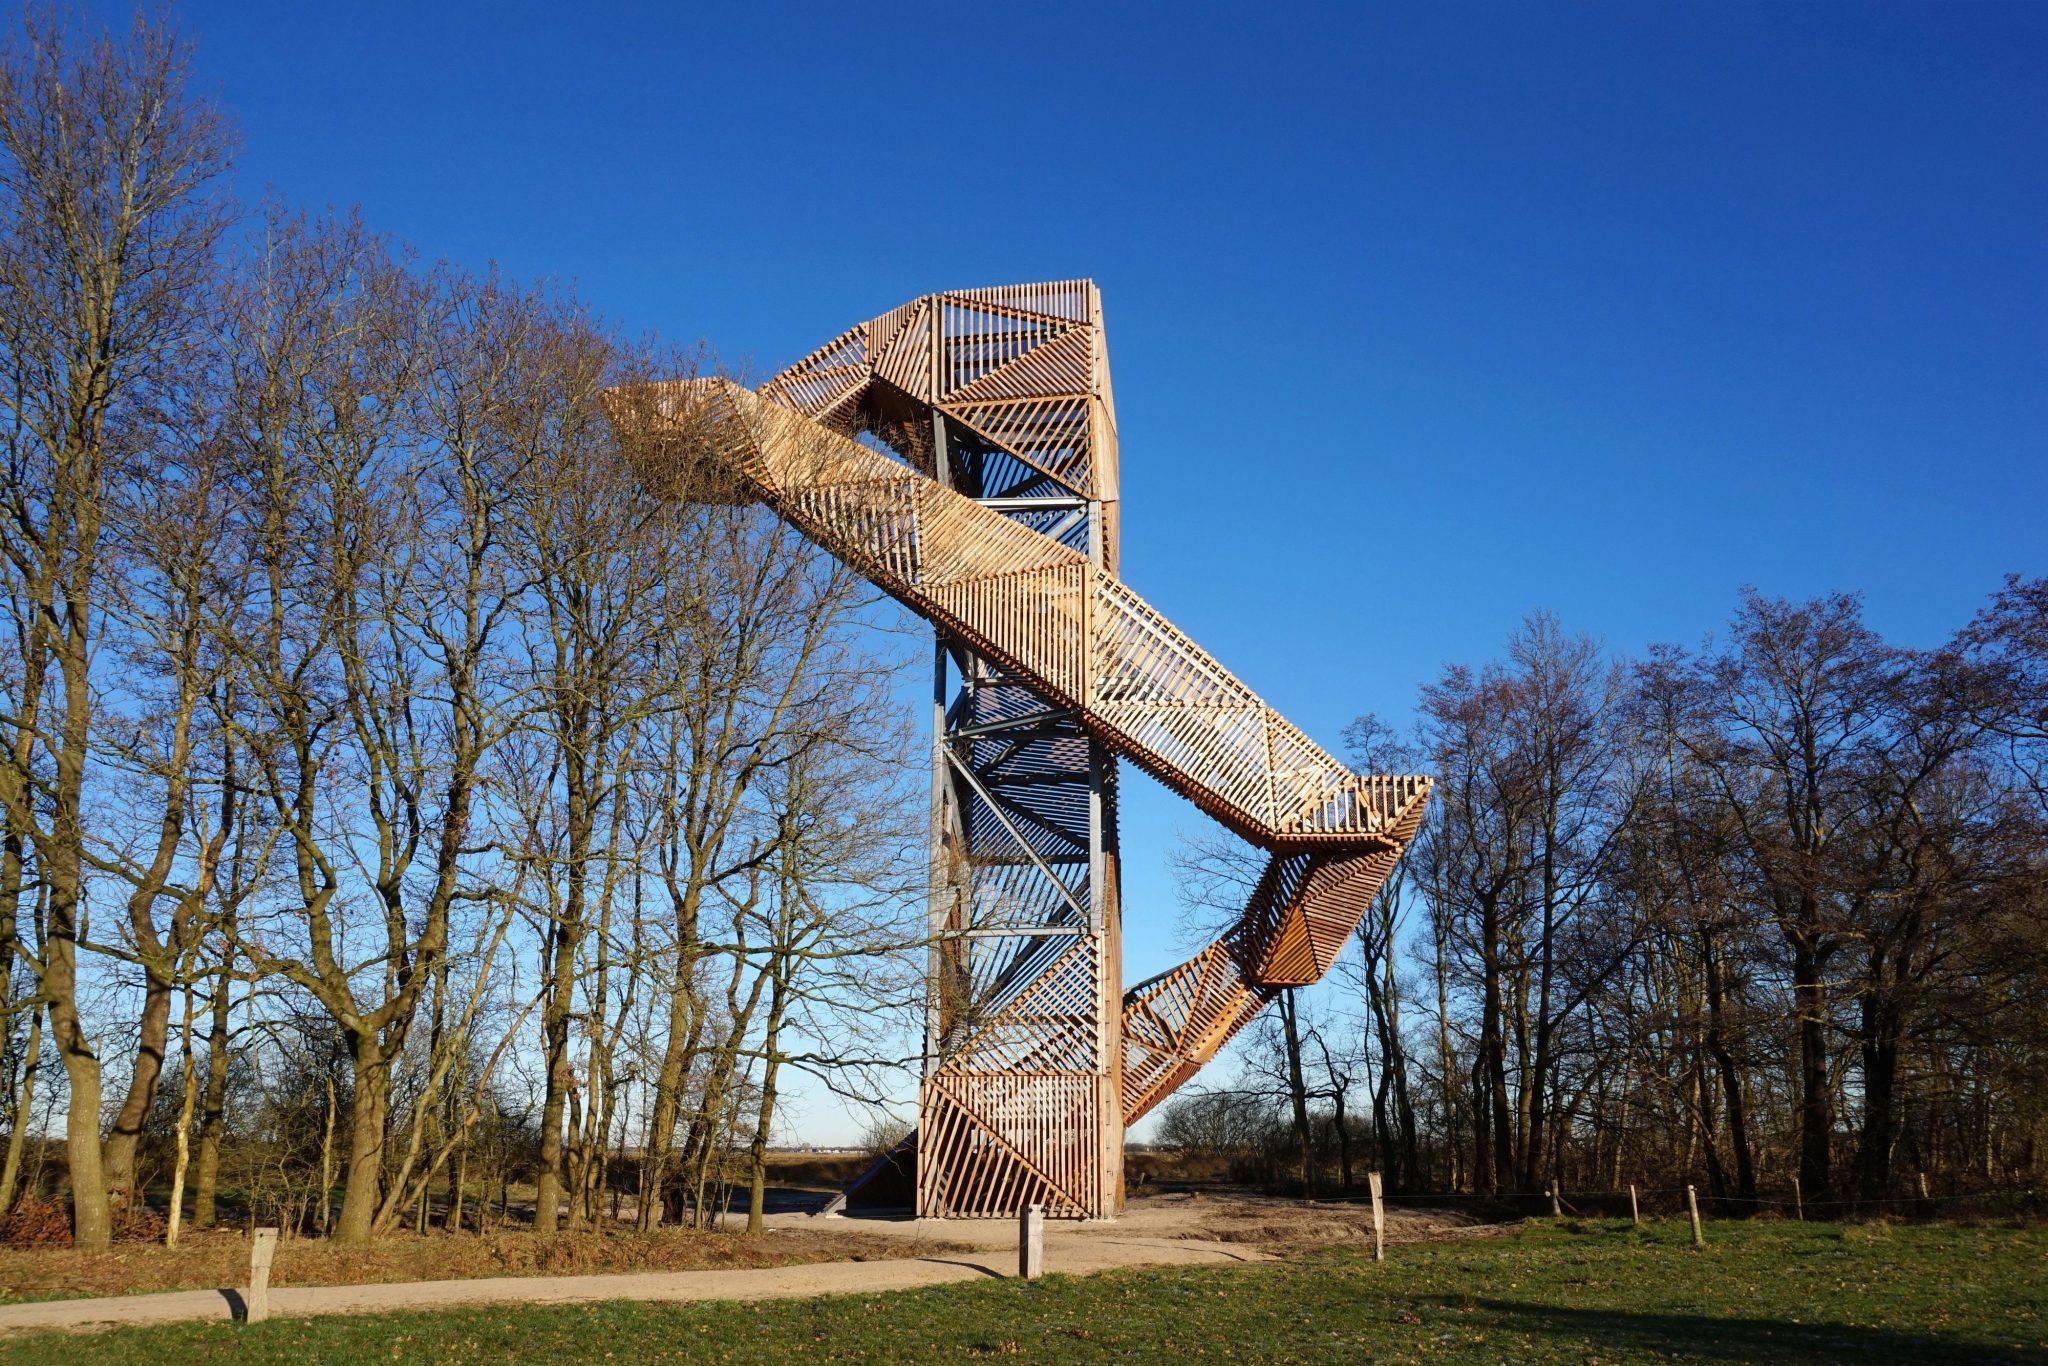 Ateliereen-uitkijktoren-onlanden-03